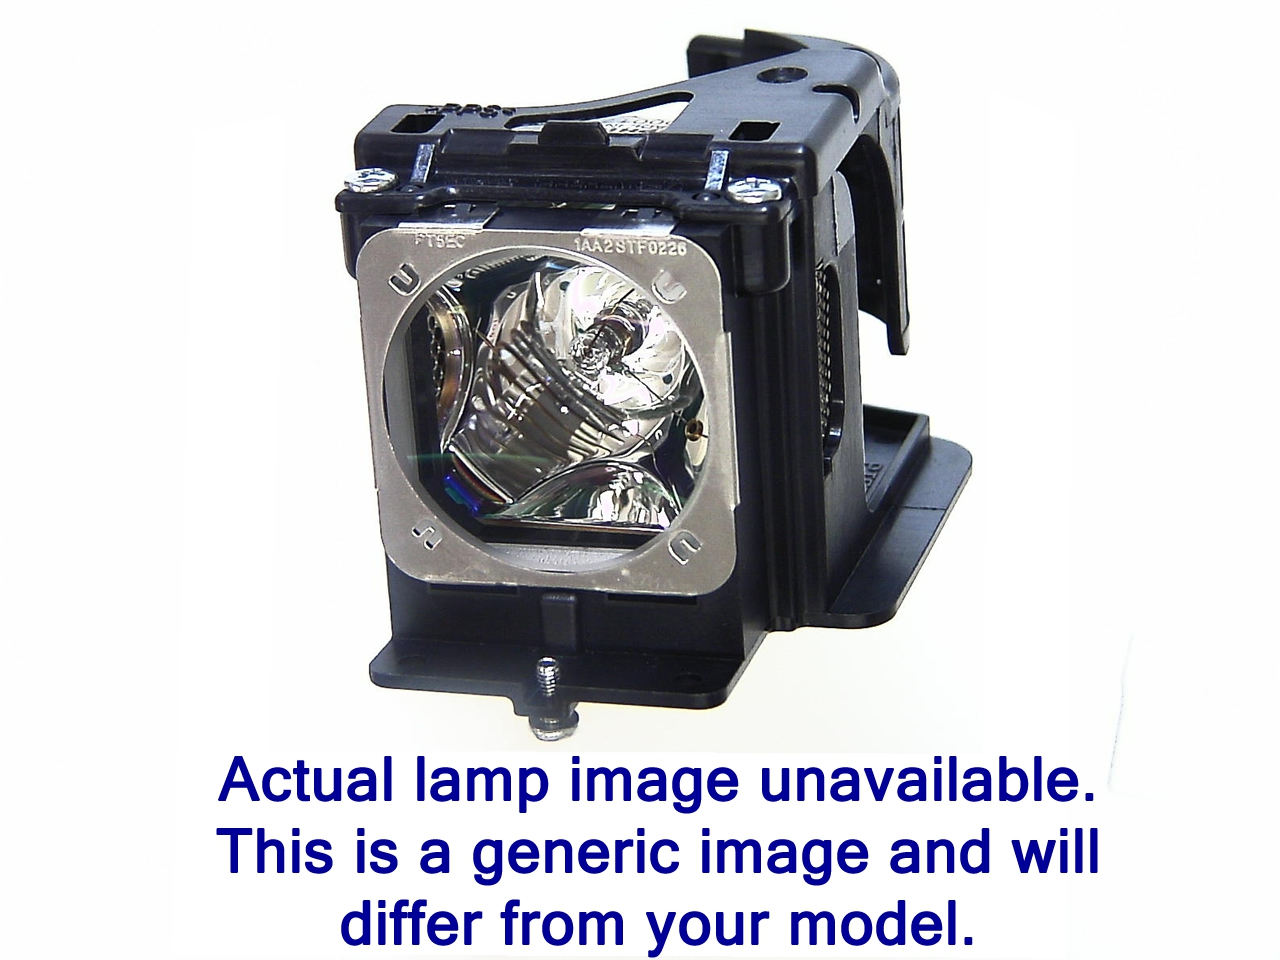 Lámpara LG RZ-48SZ40RB